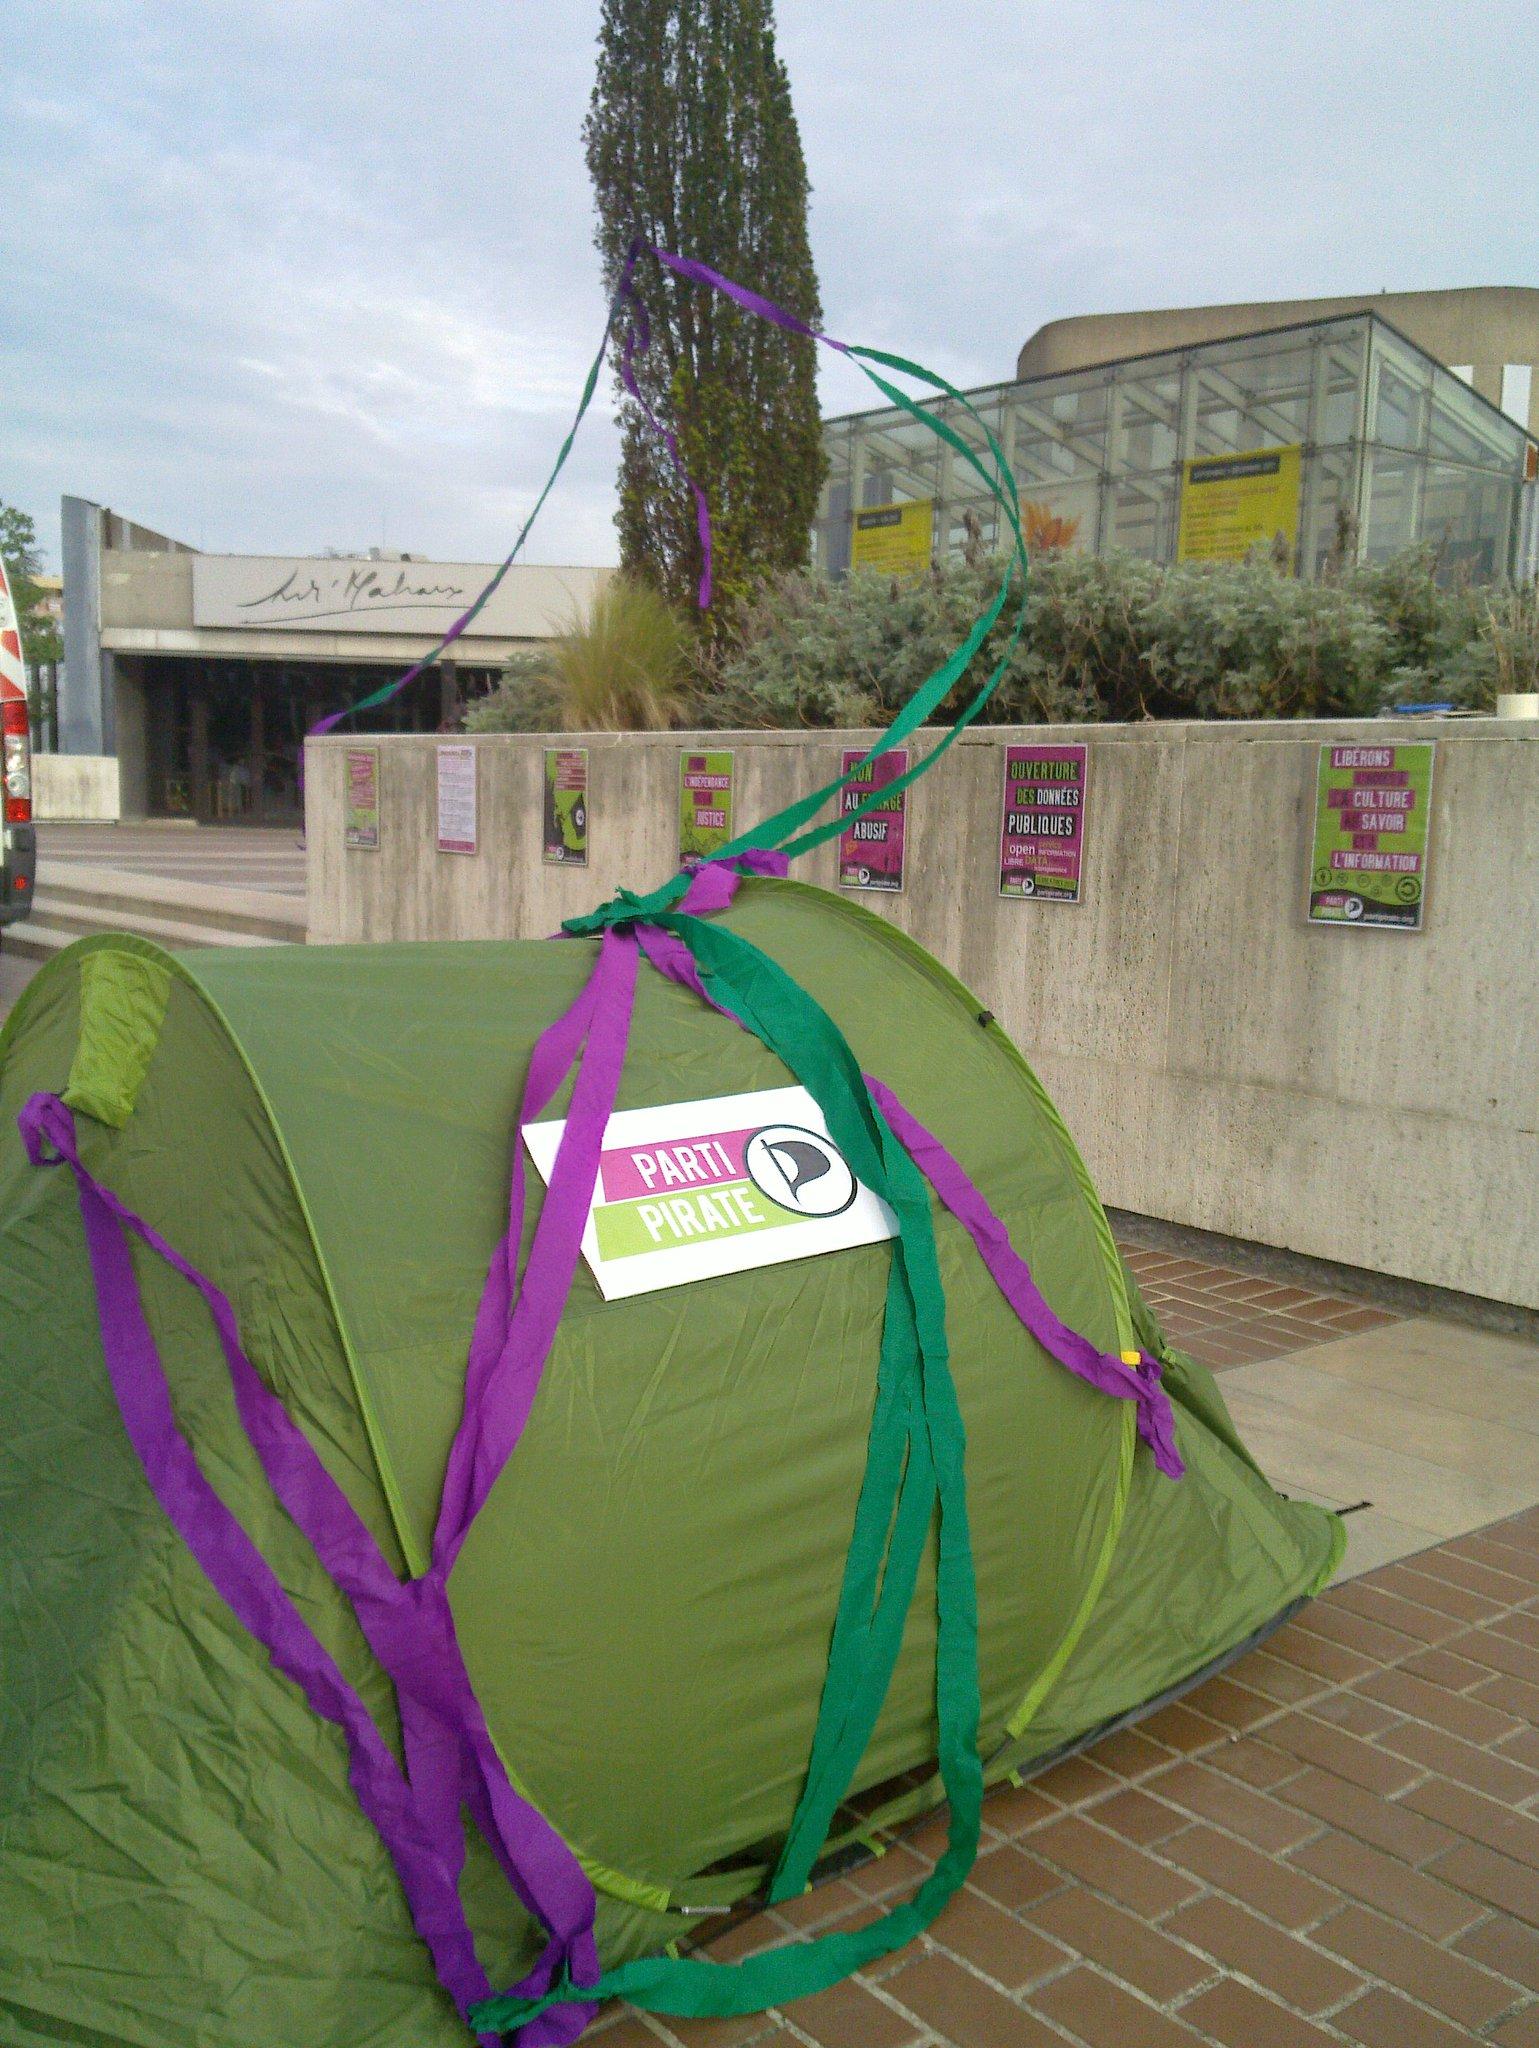 RT @davidnadasi: Tente de campagne piratée. @PartiPirate #Circo9402 #Législatives2012 http://t.co/A49vES4C